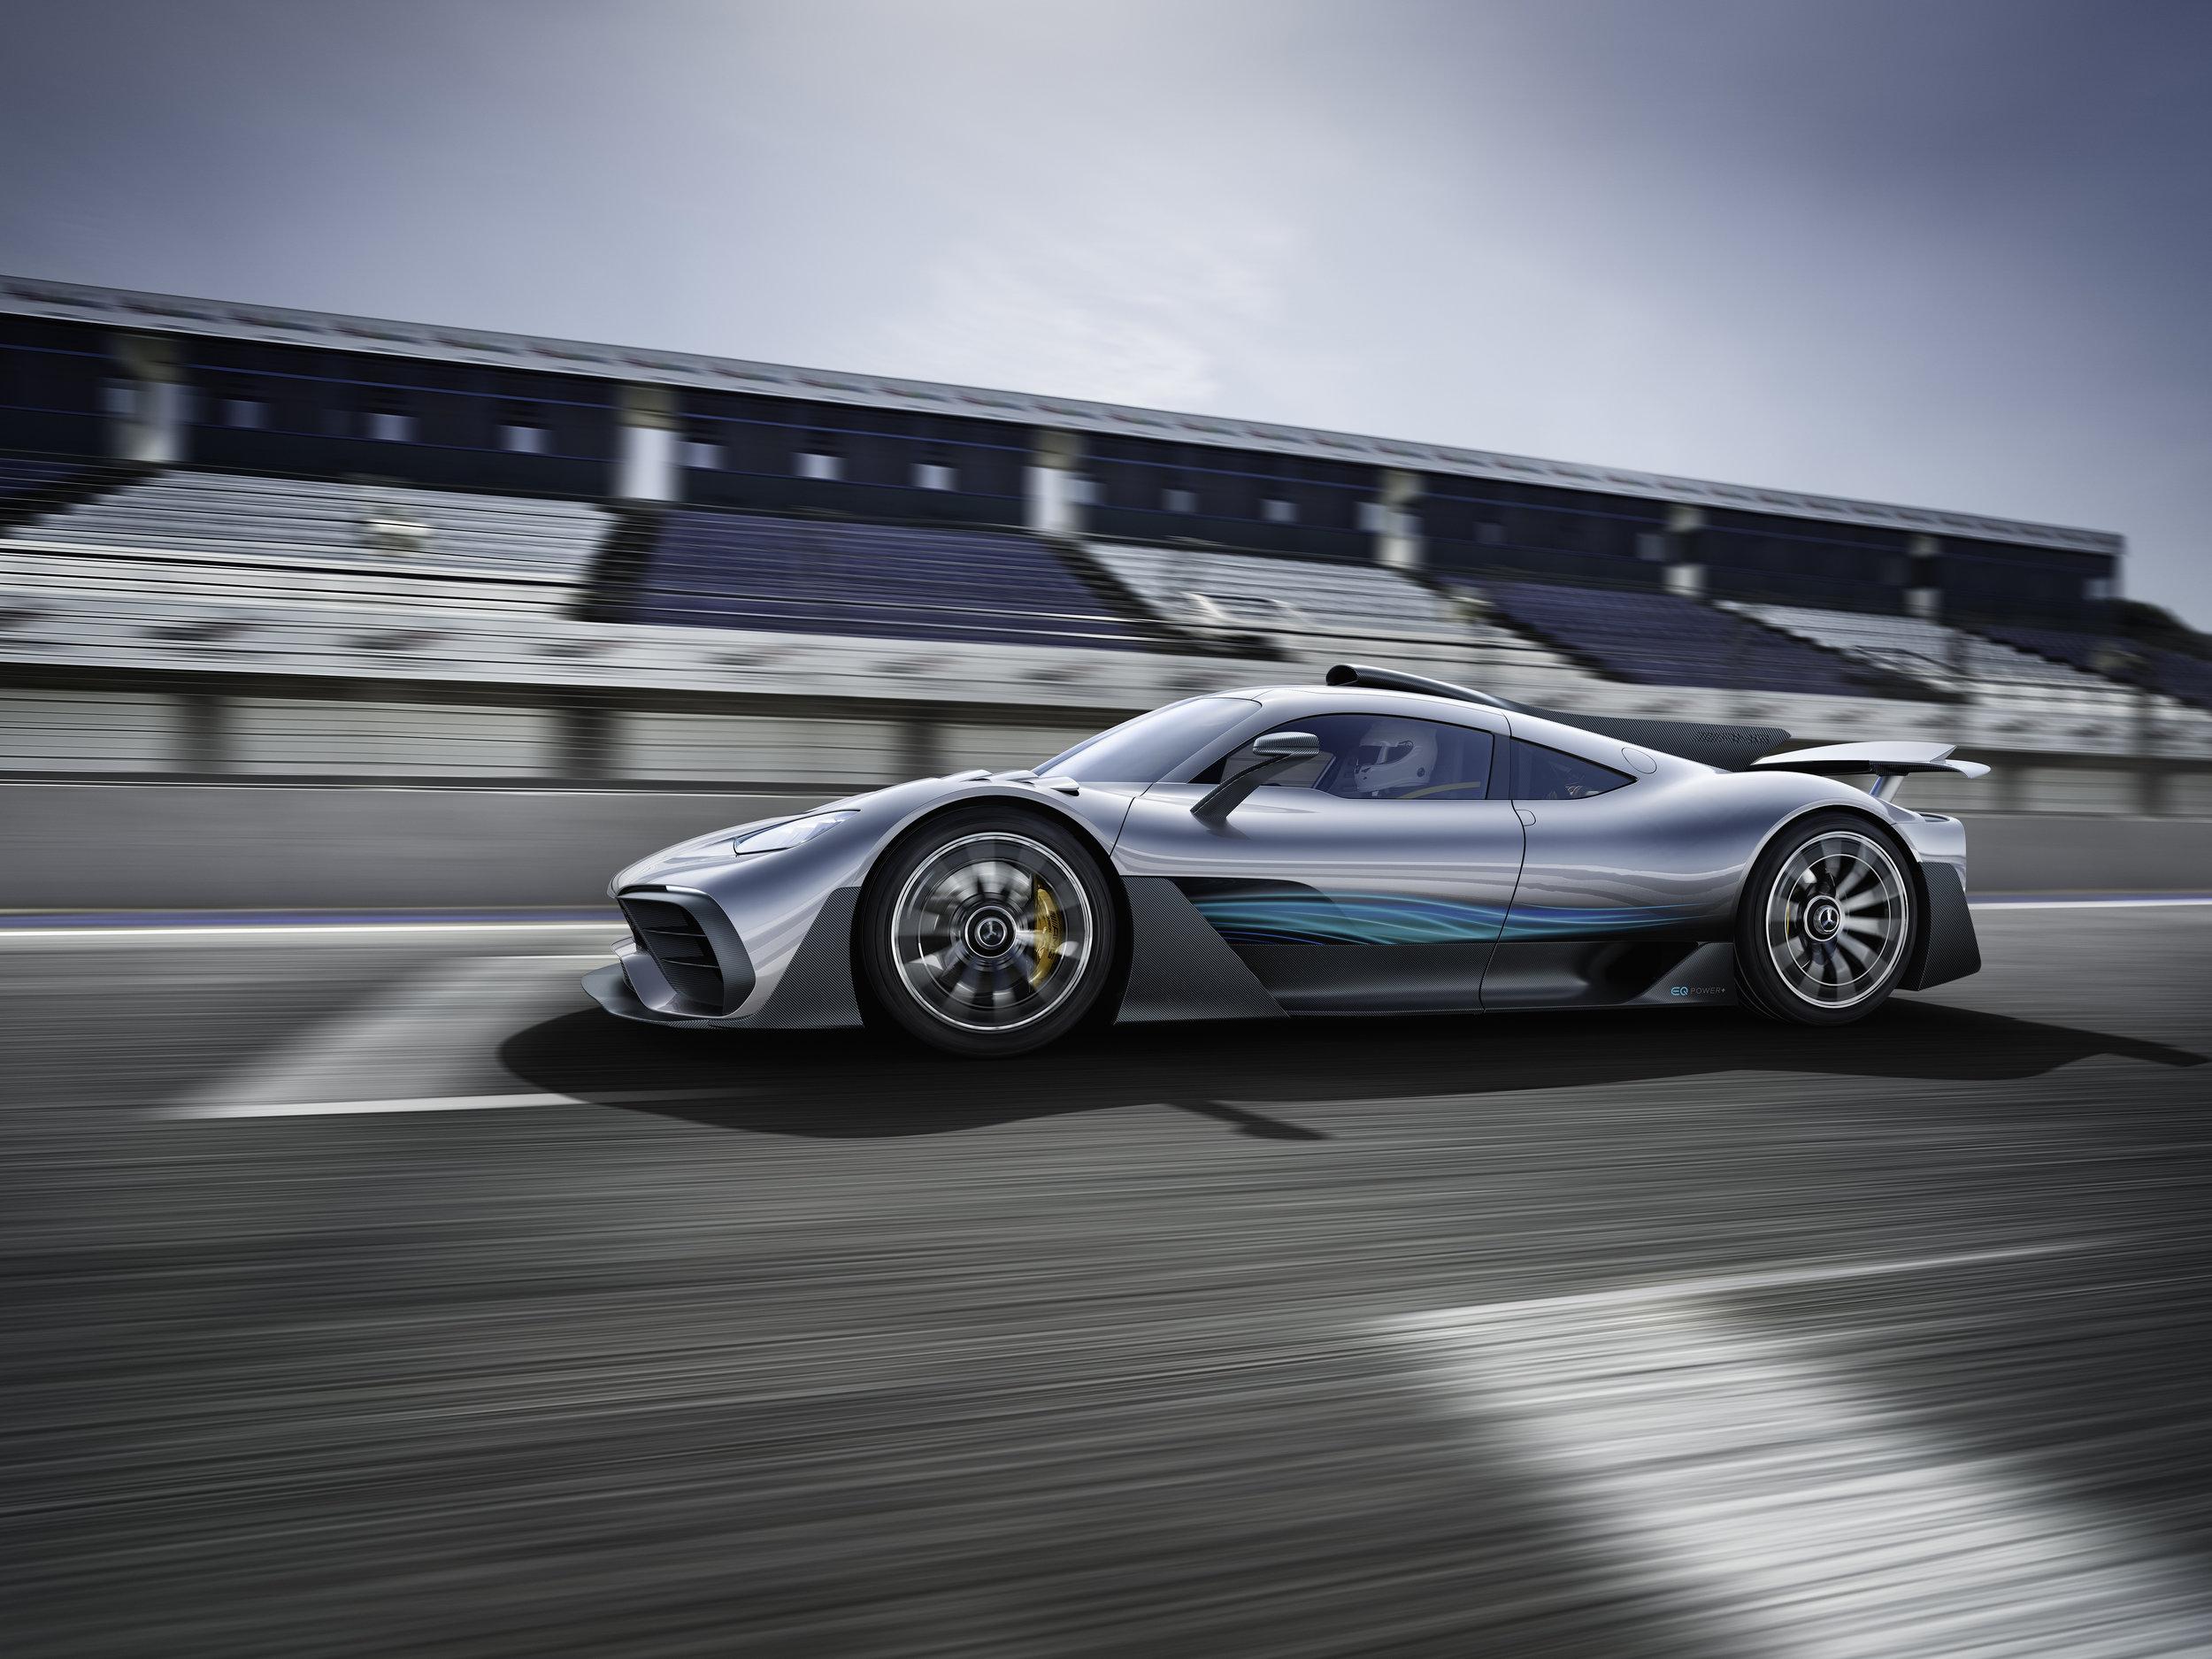 © Daimler AG